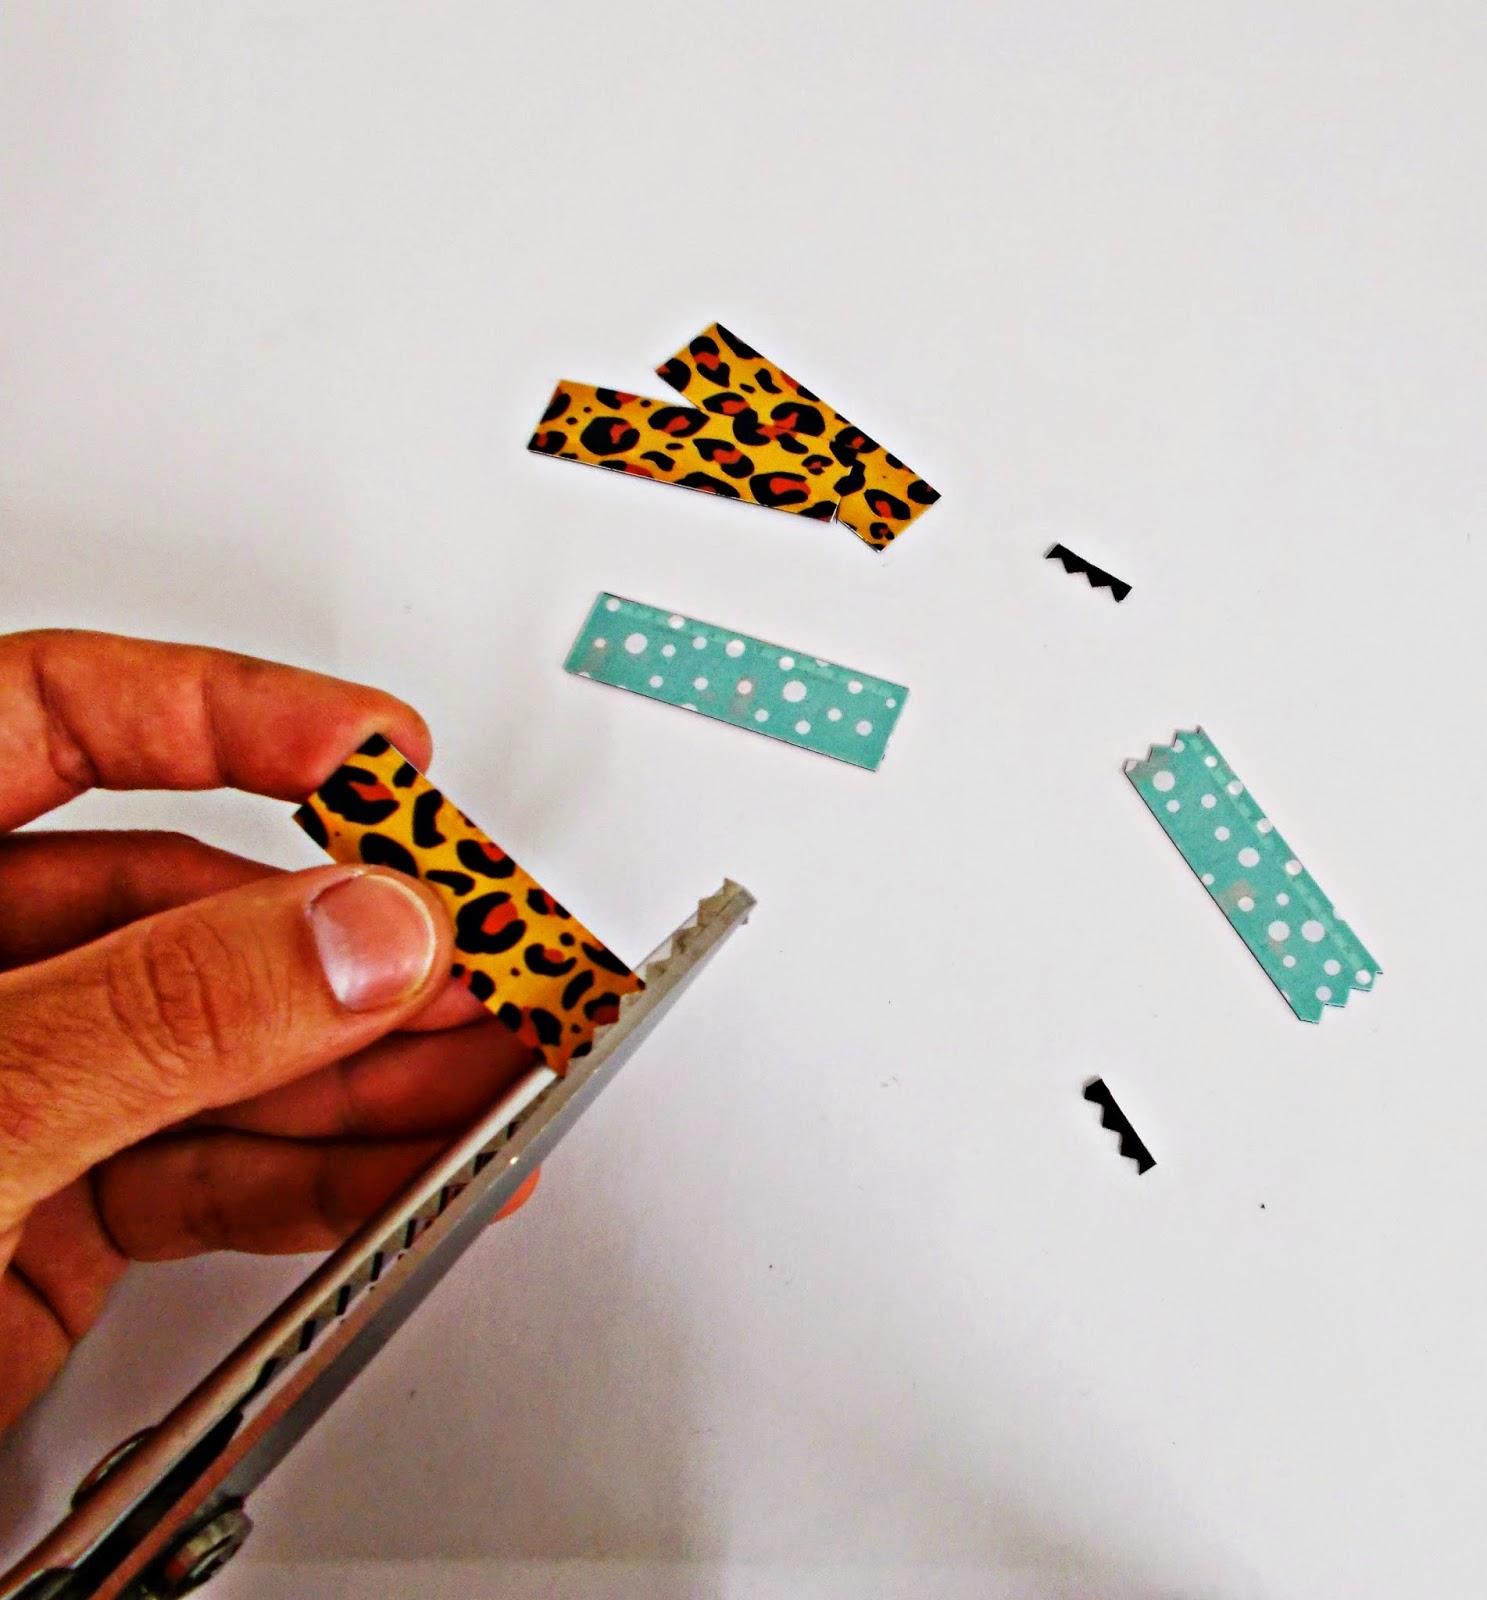 DIY-reciclar-imames-nevera-washi tape-5